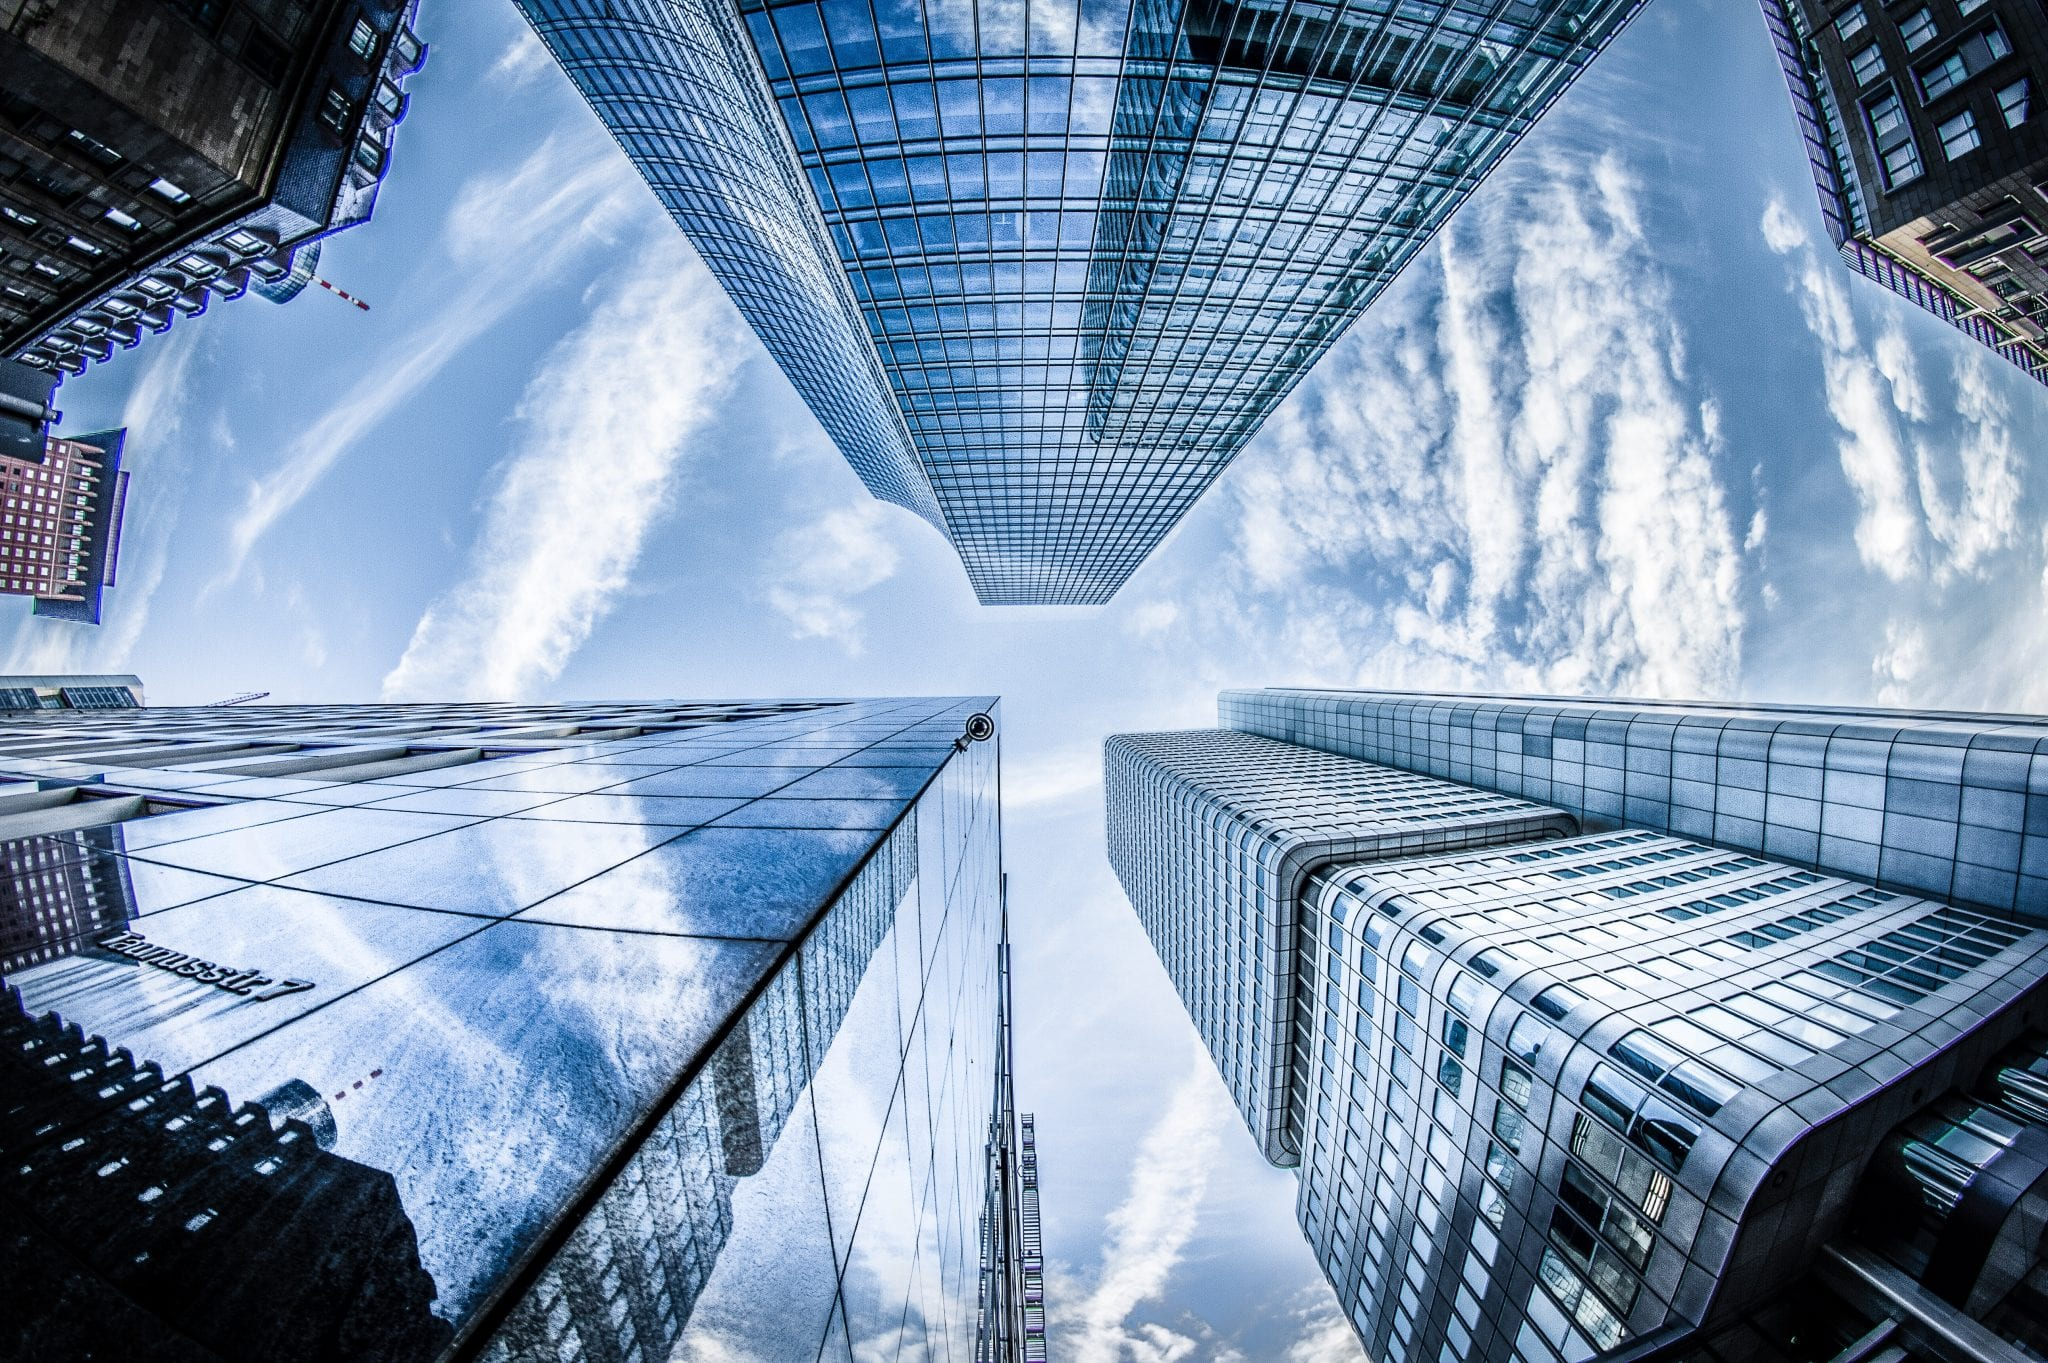 High-rise buildings facades